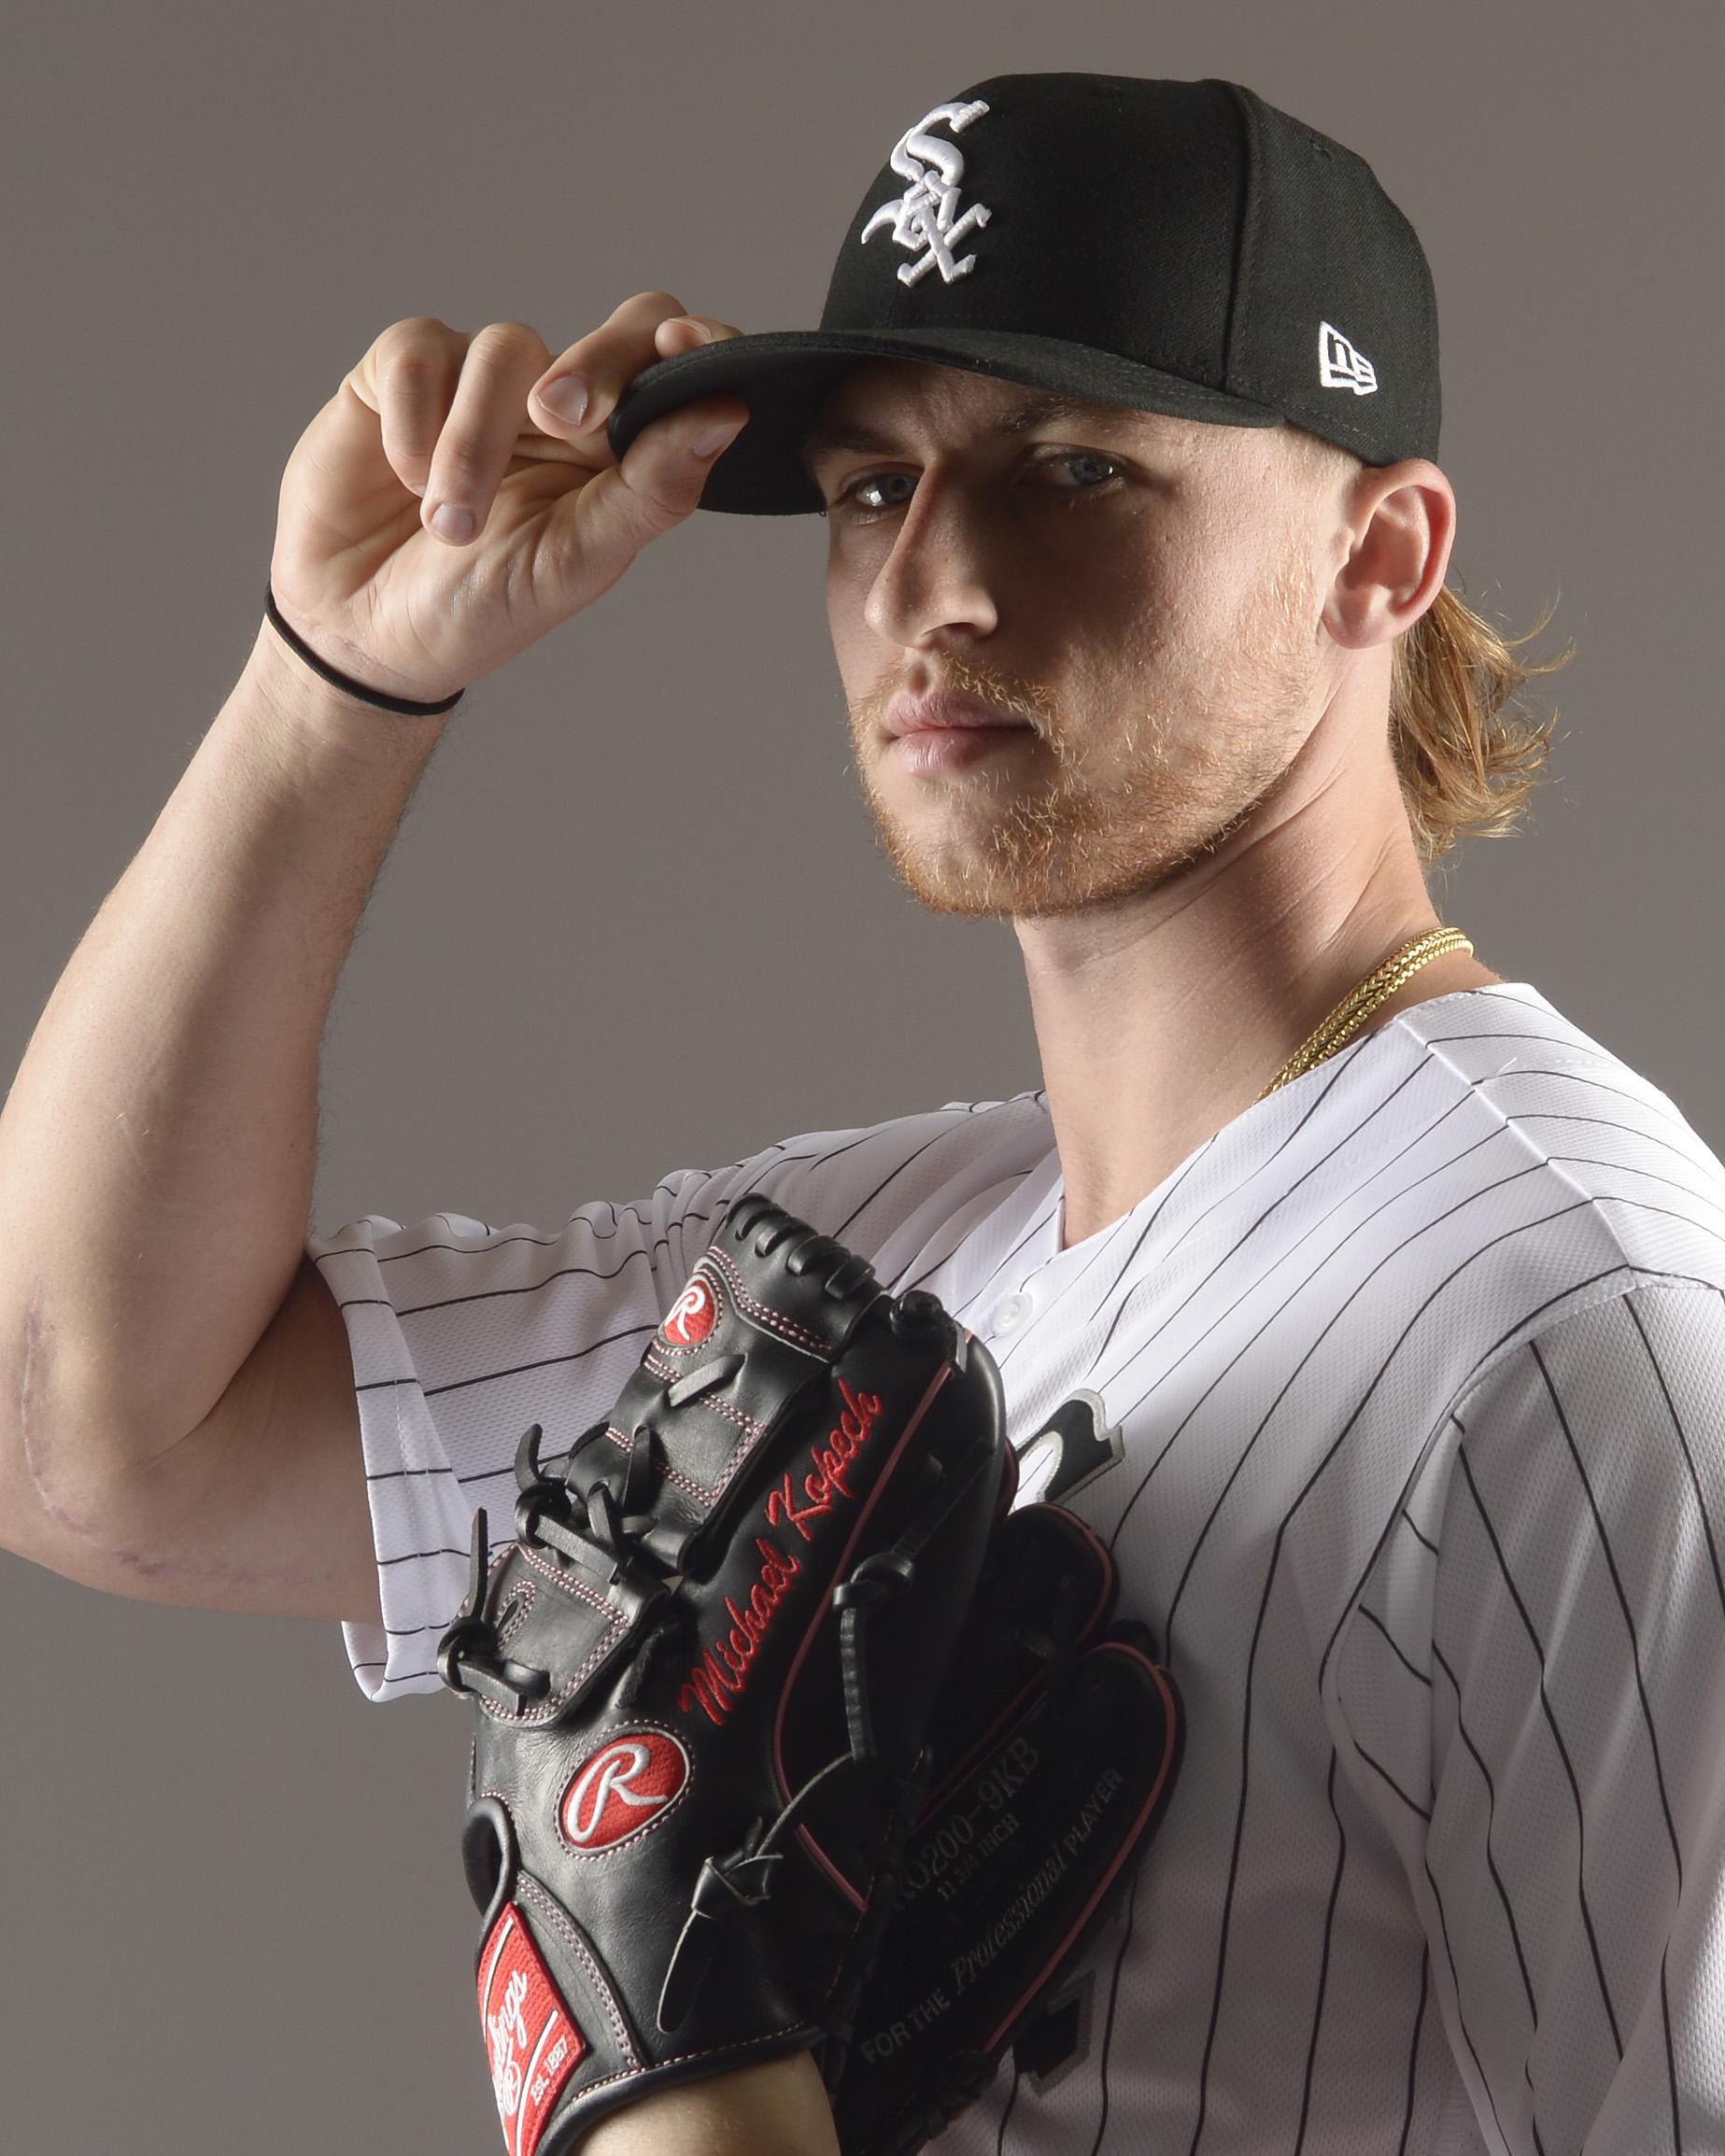 Chicago White Sox Photo Day